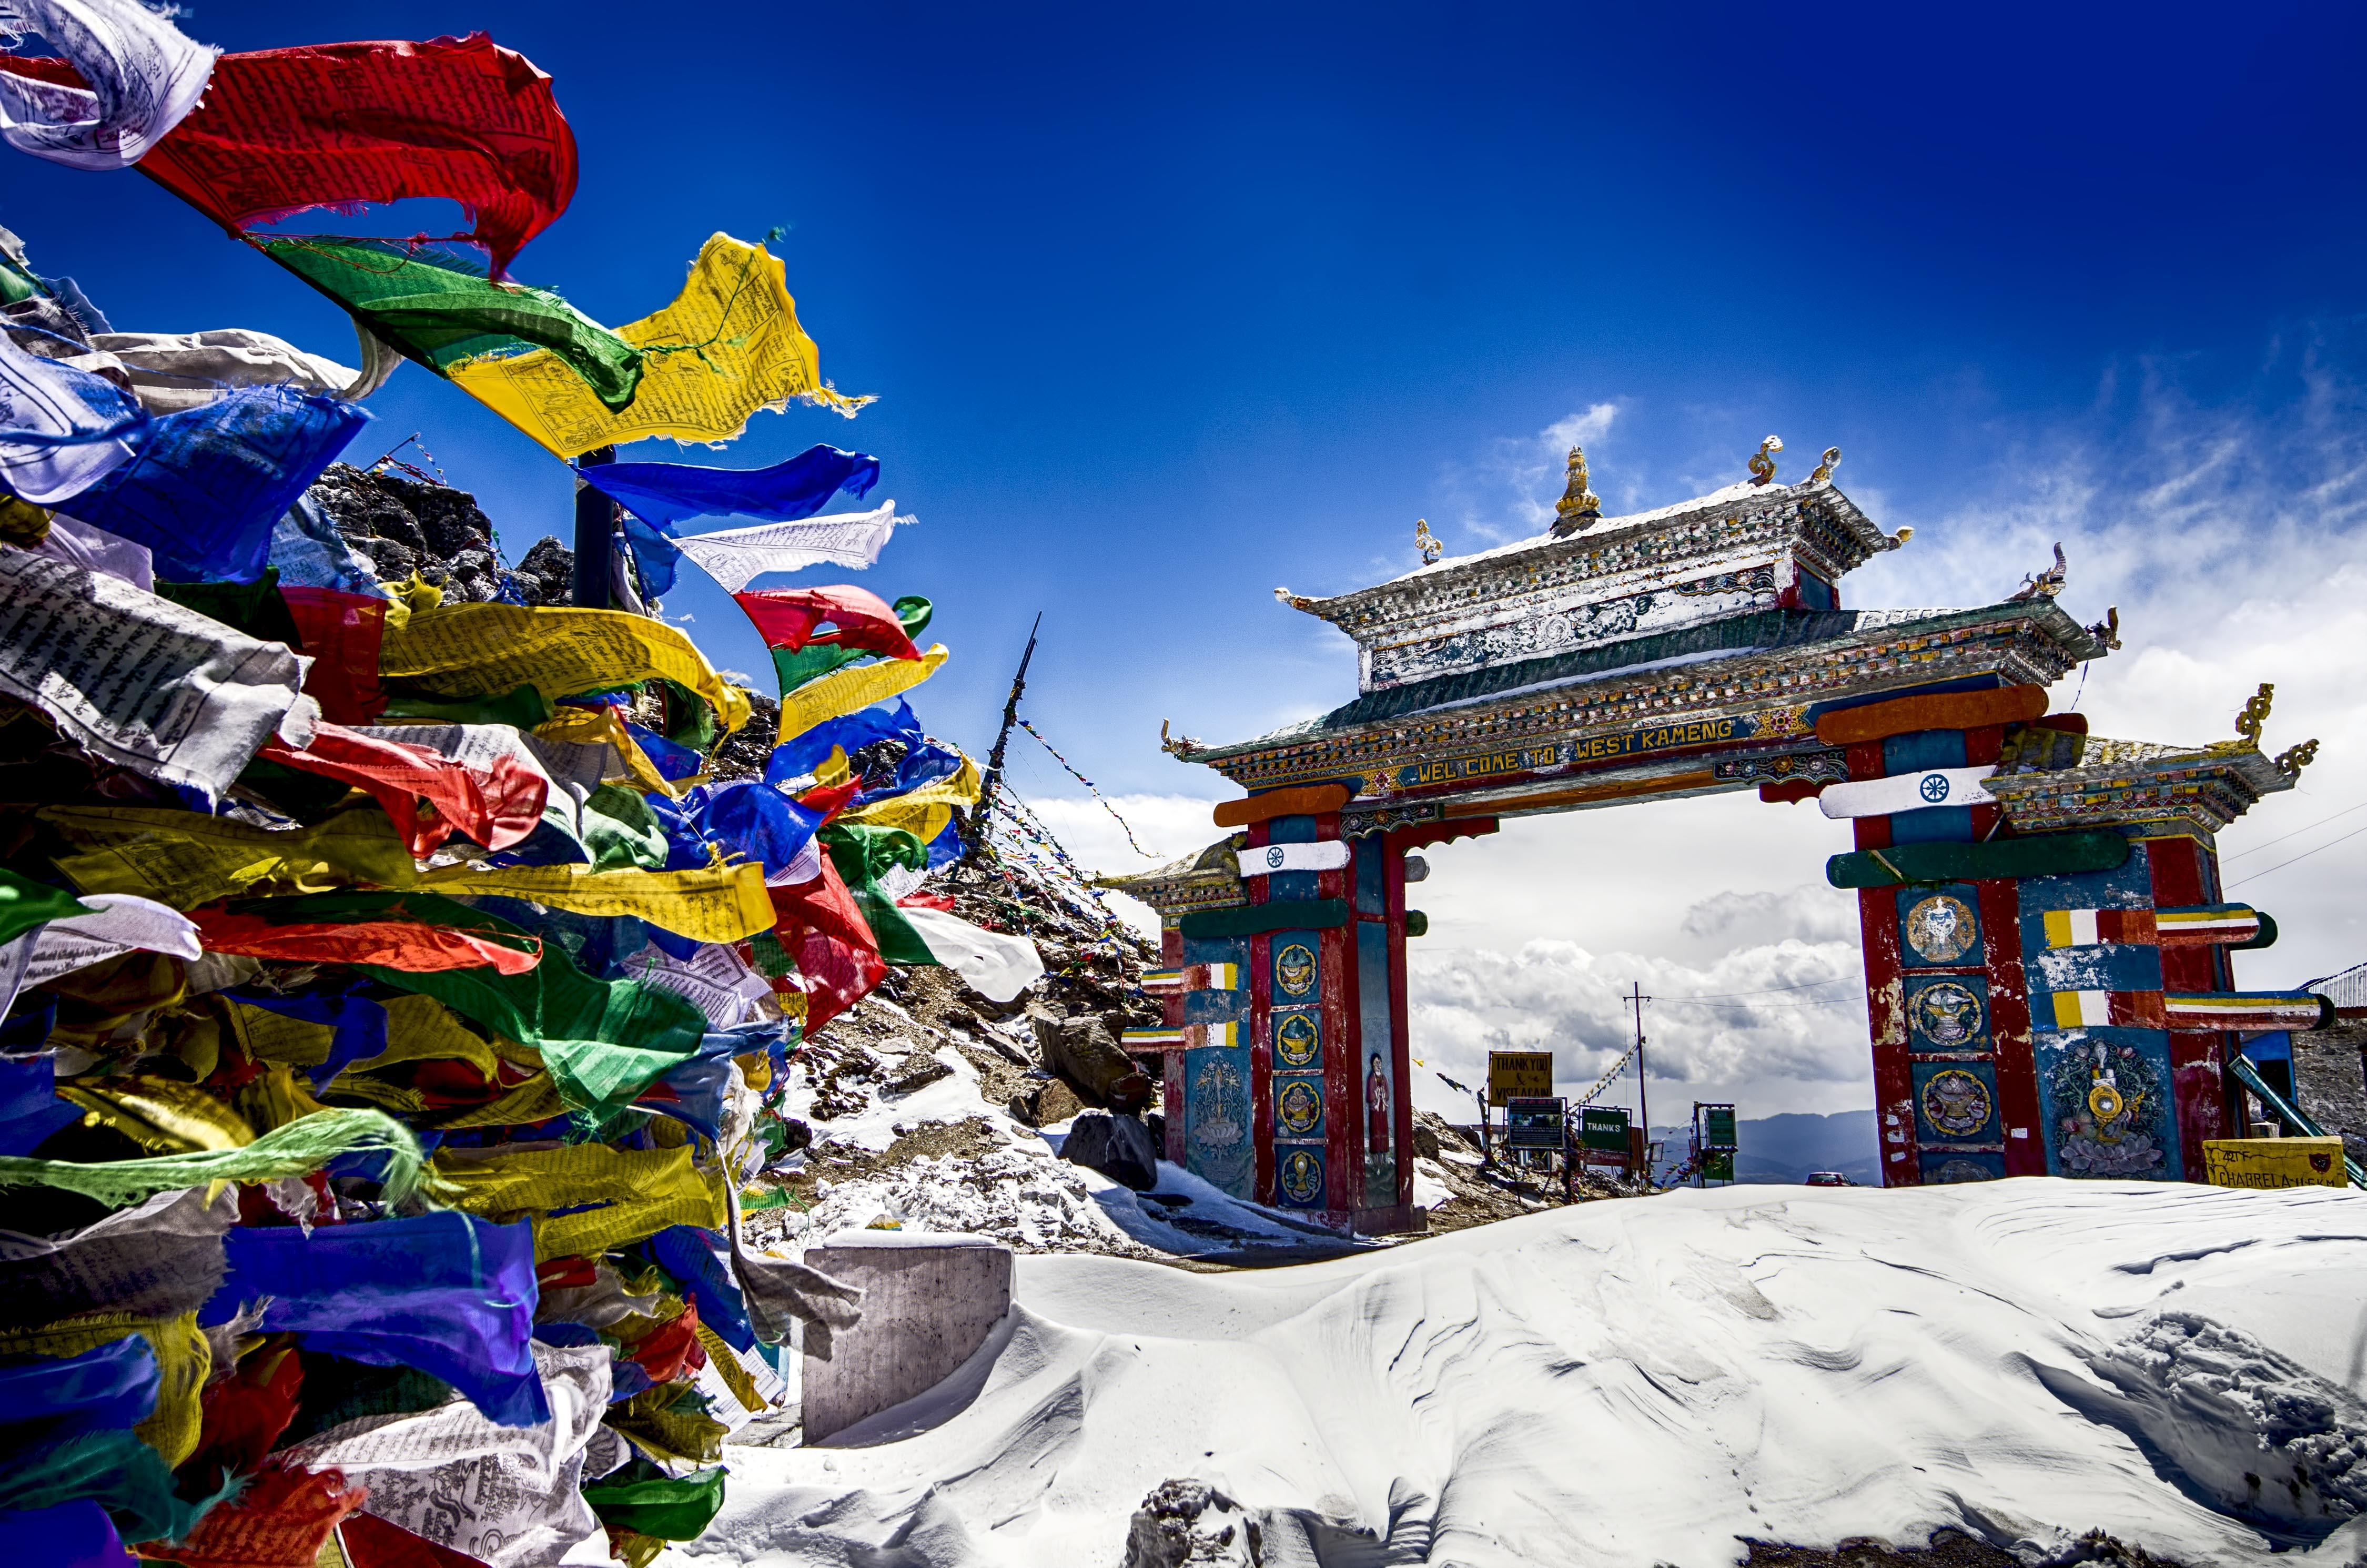 2. Guwahati to Tawang – The Gateway to Tibet